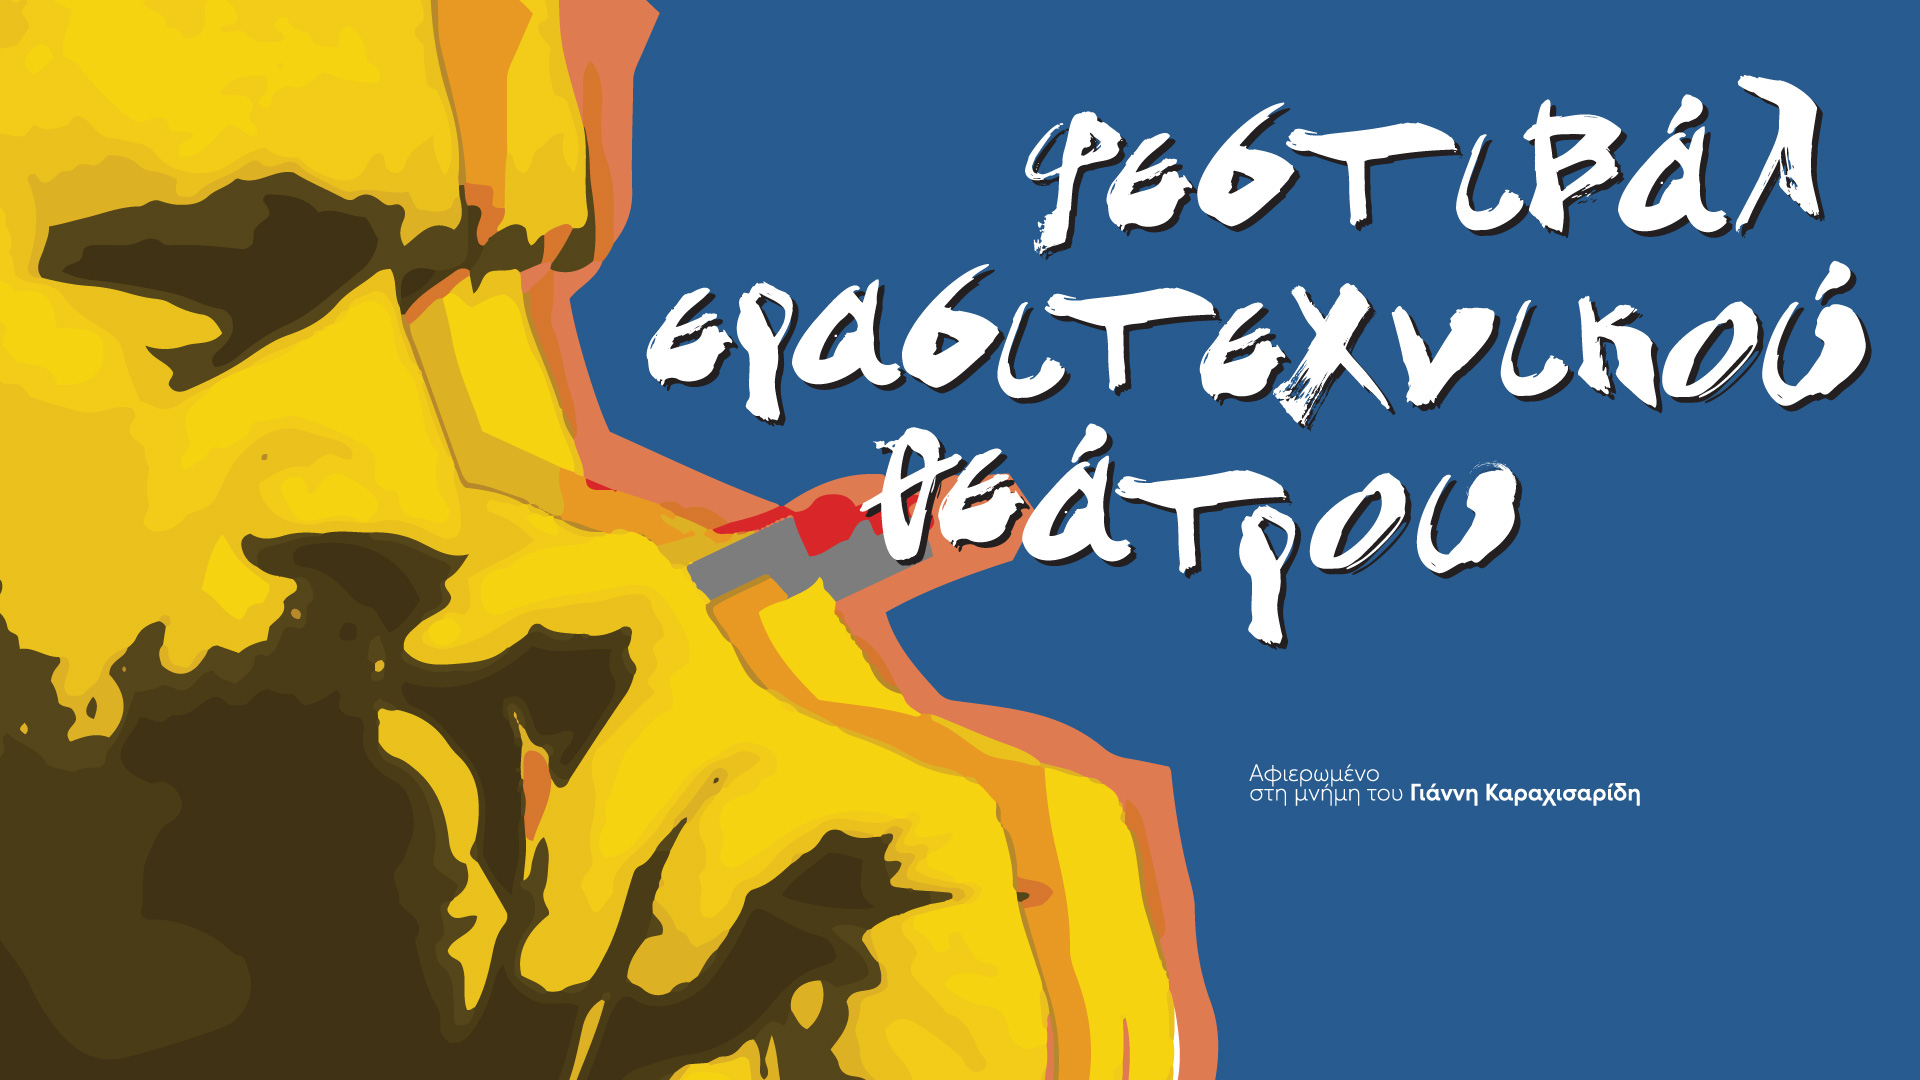 festival-erasitexnikou-theatrou